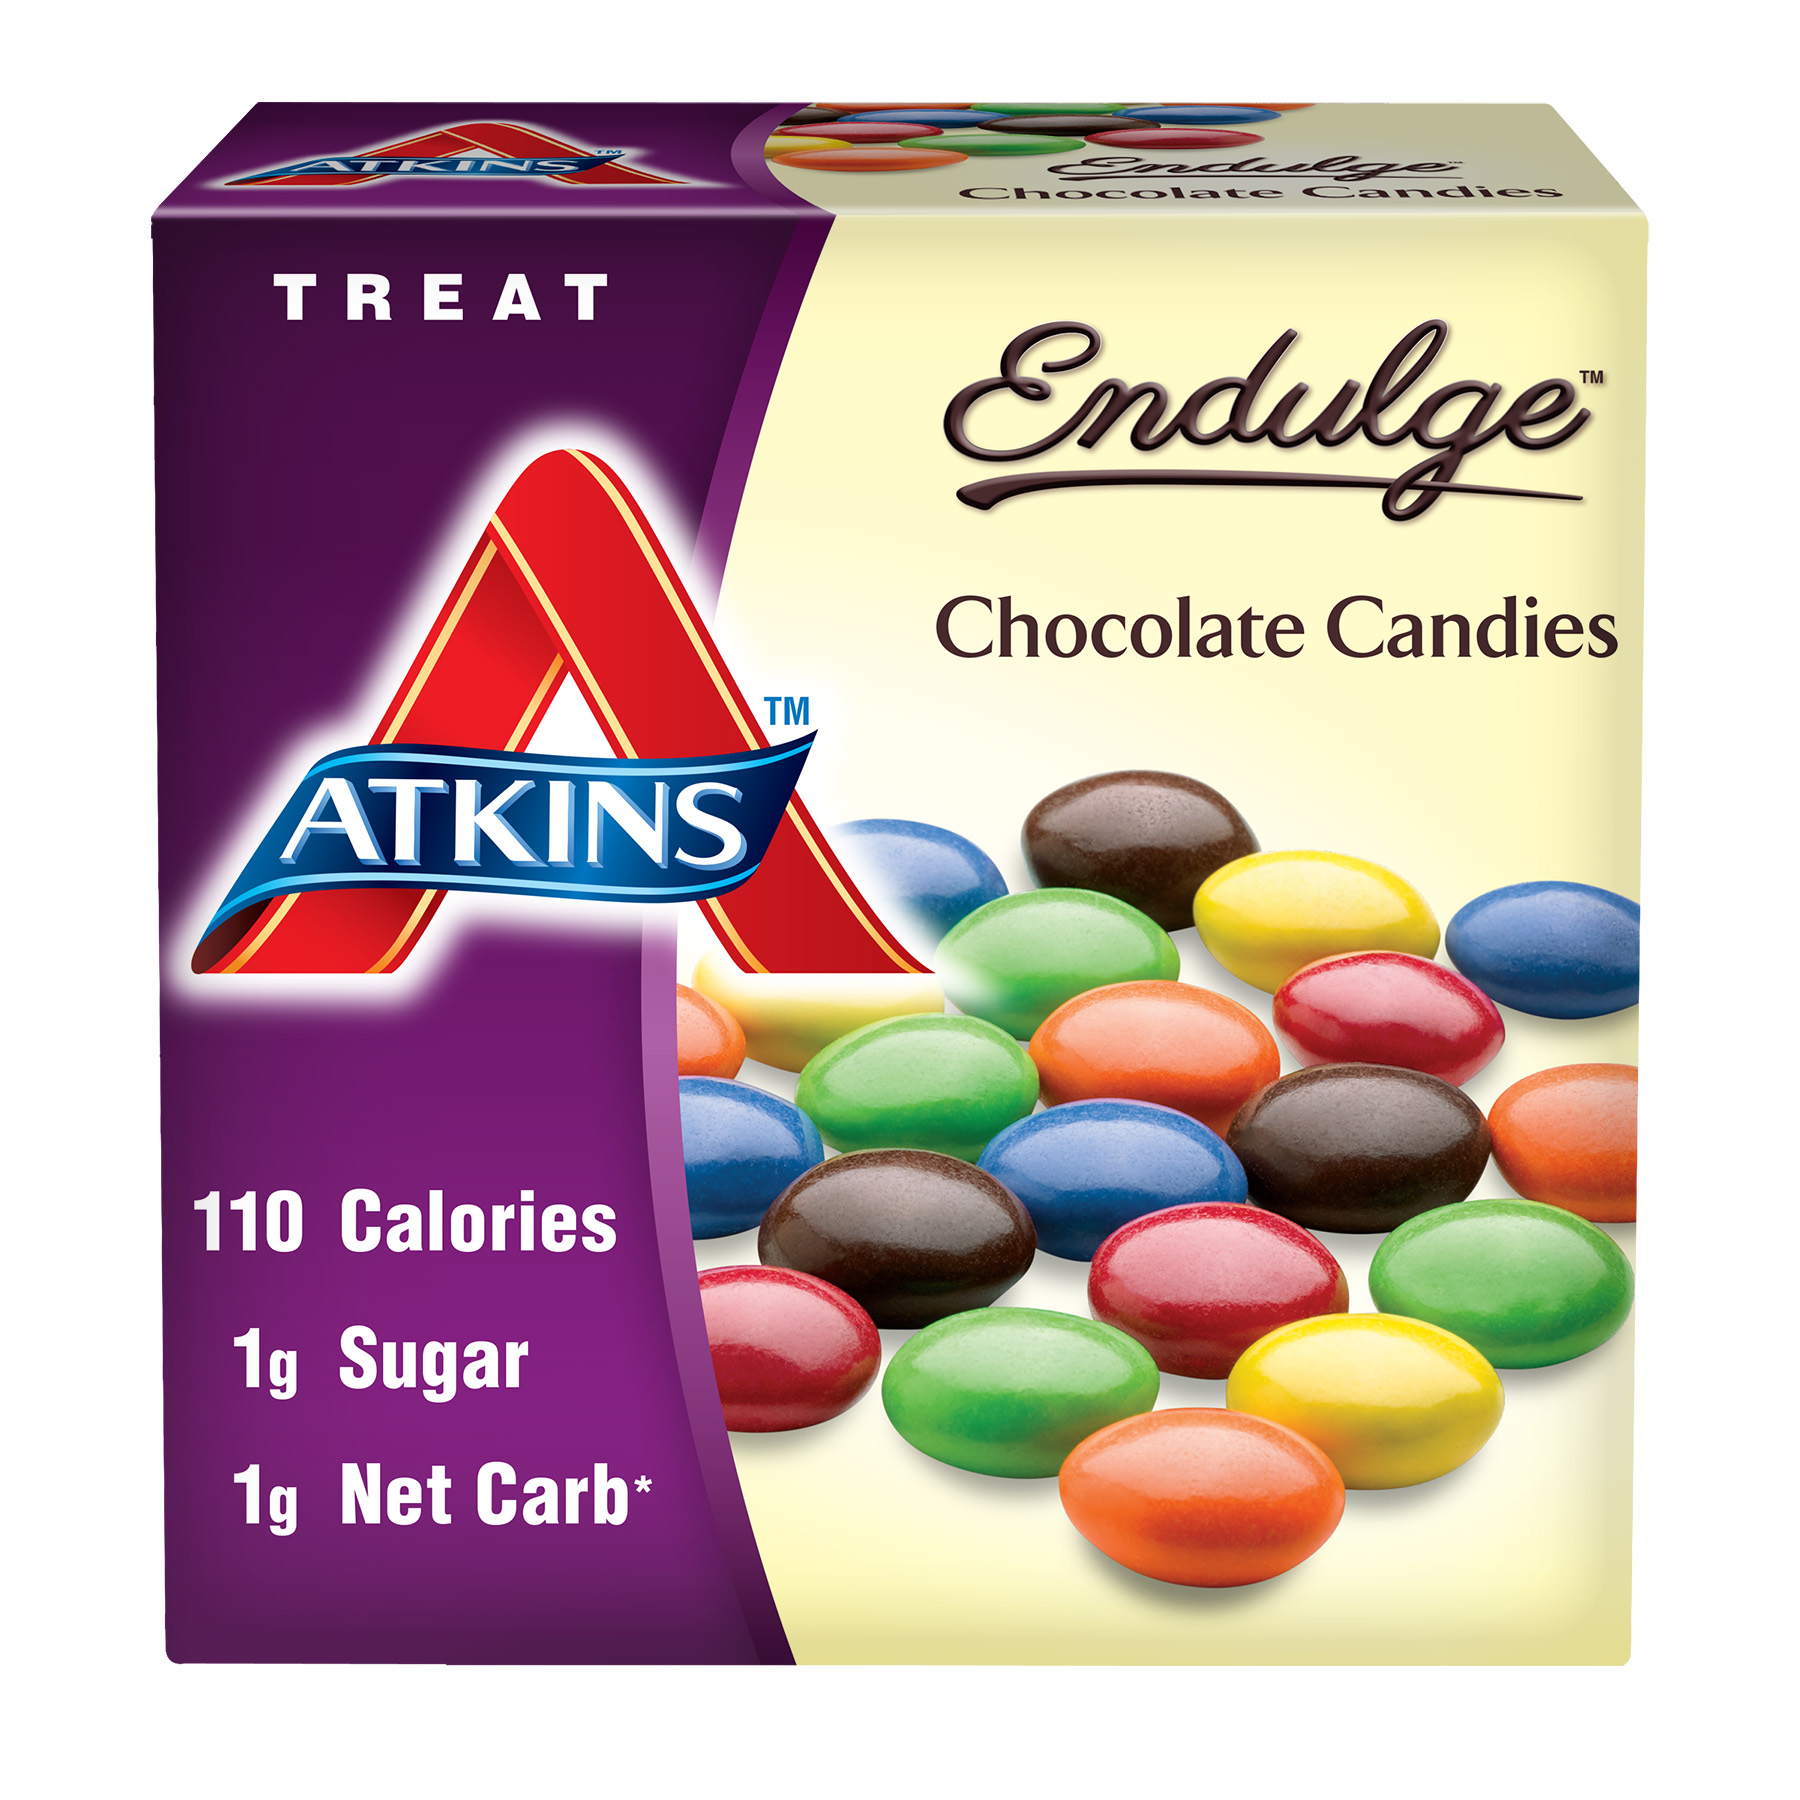 Endulge Chocolate Candies